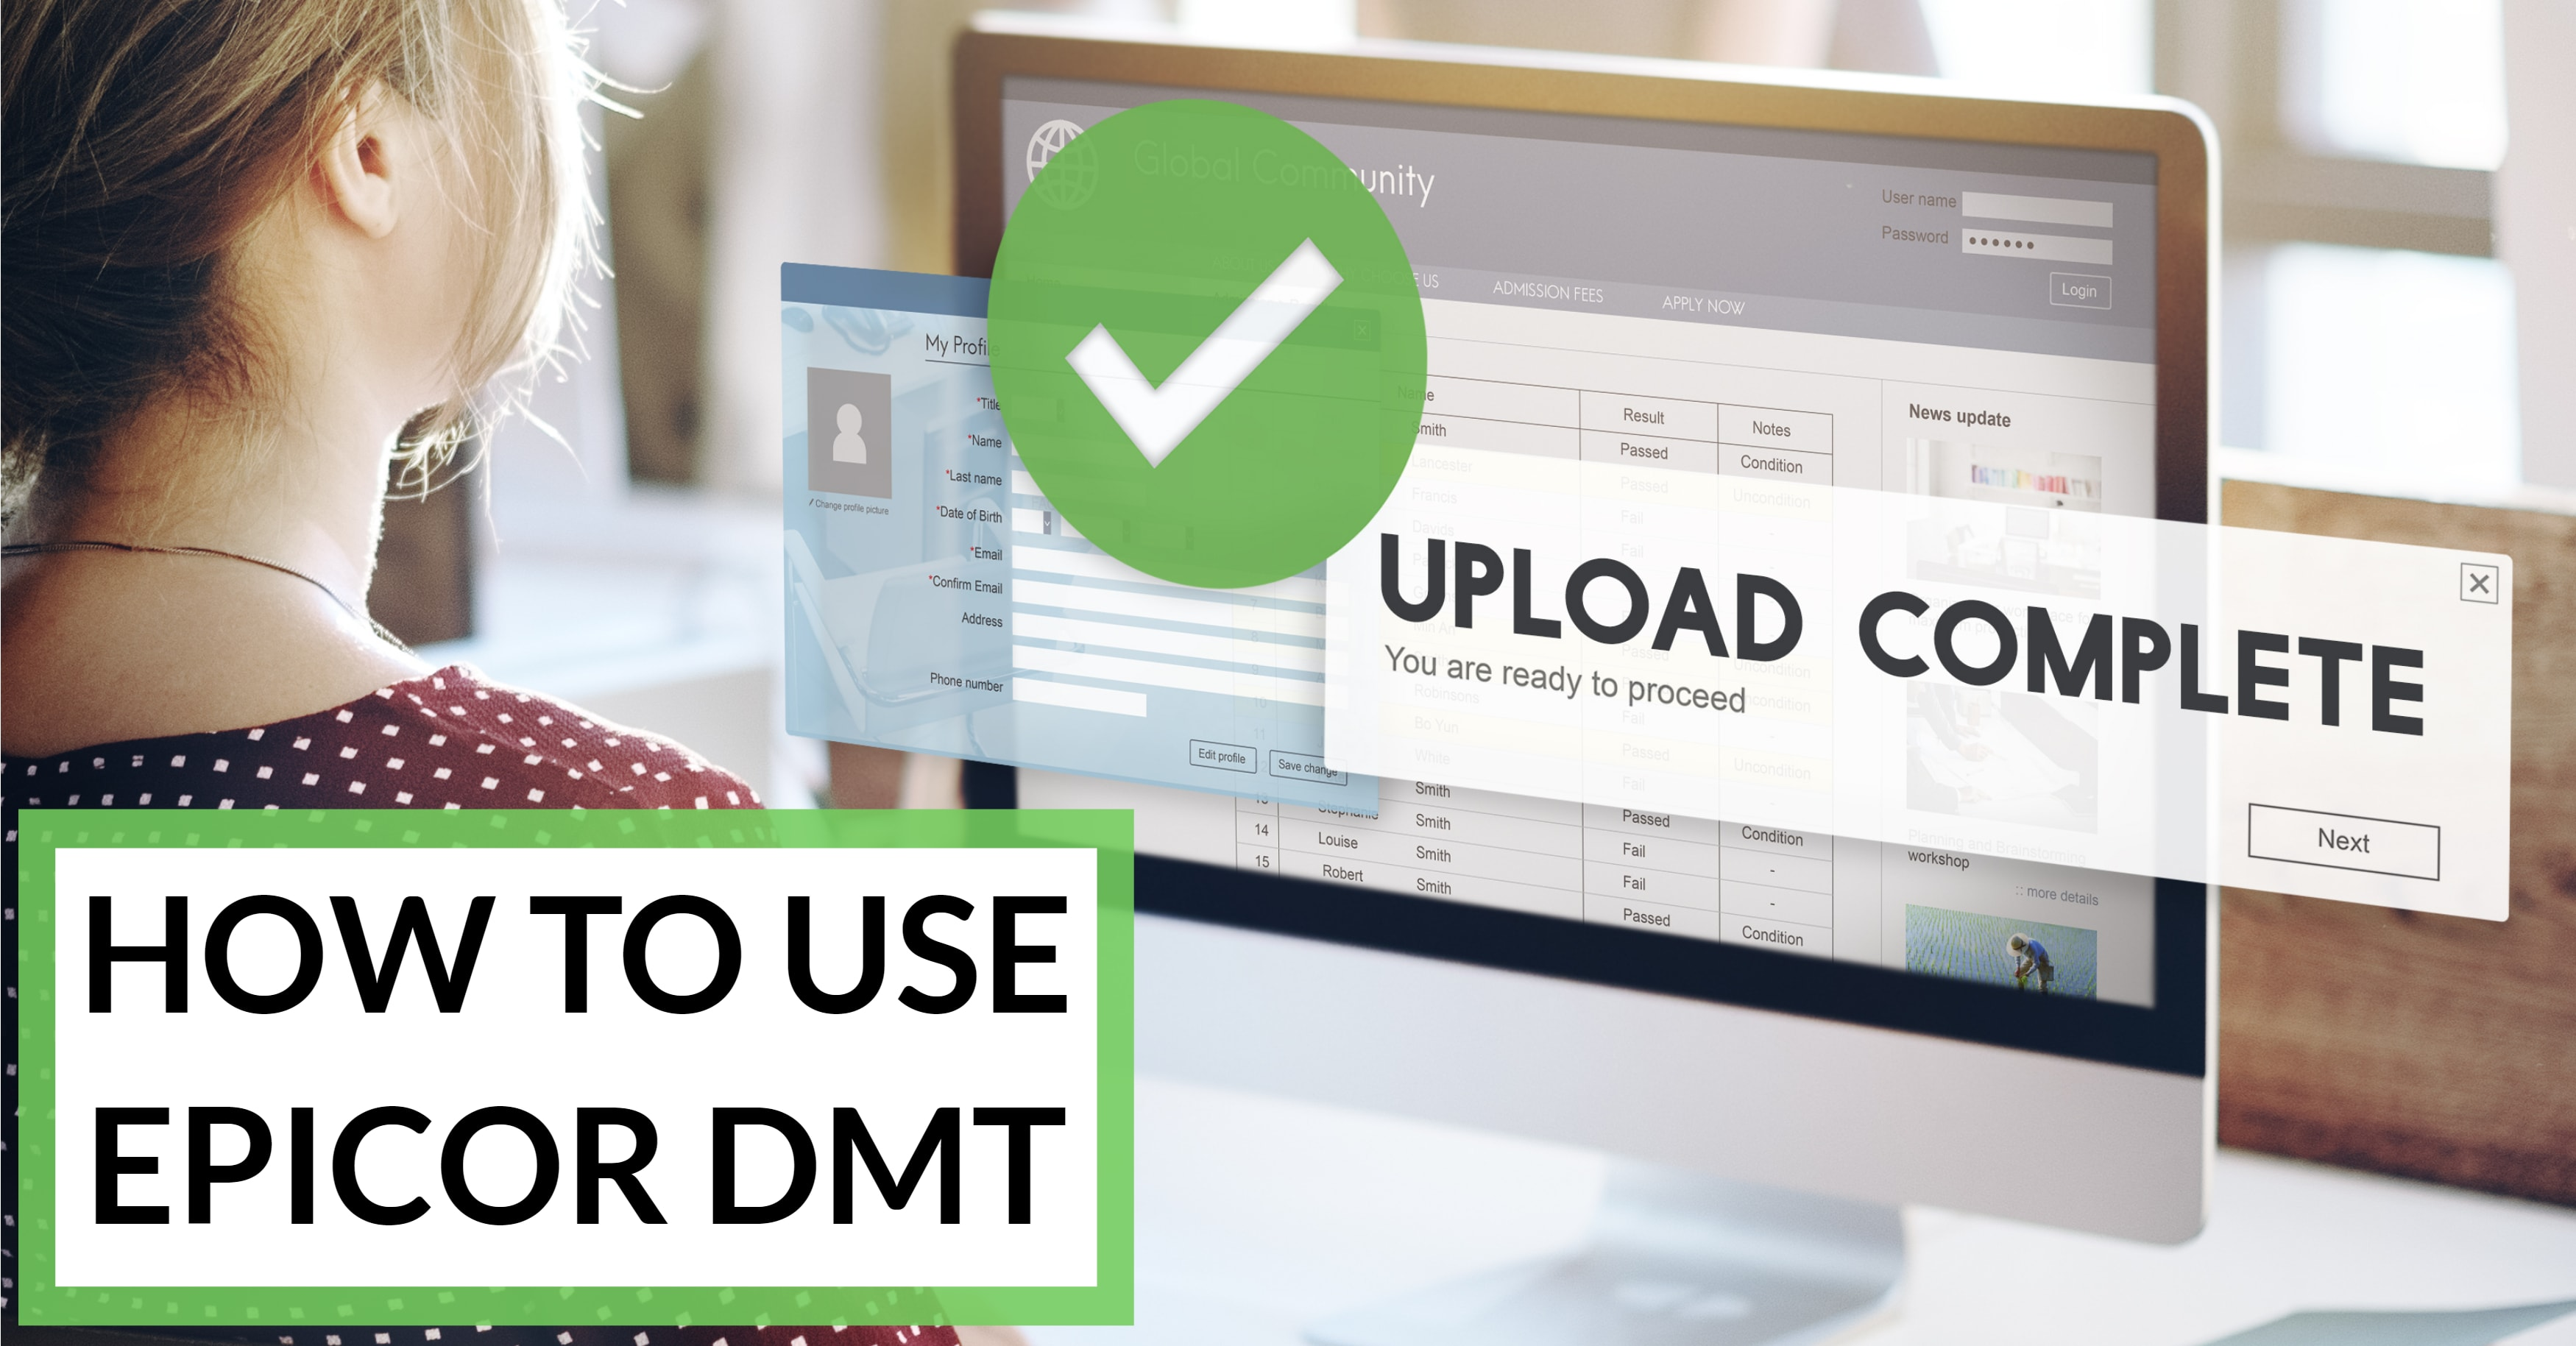 How to Upload Data using Epicor DMT